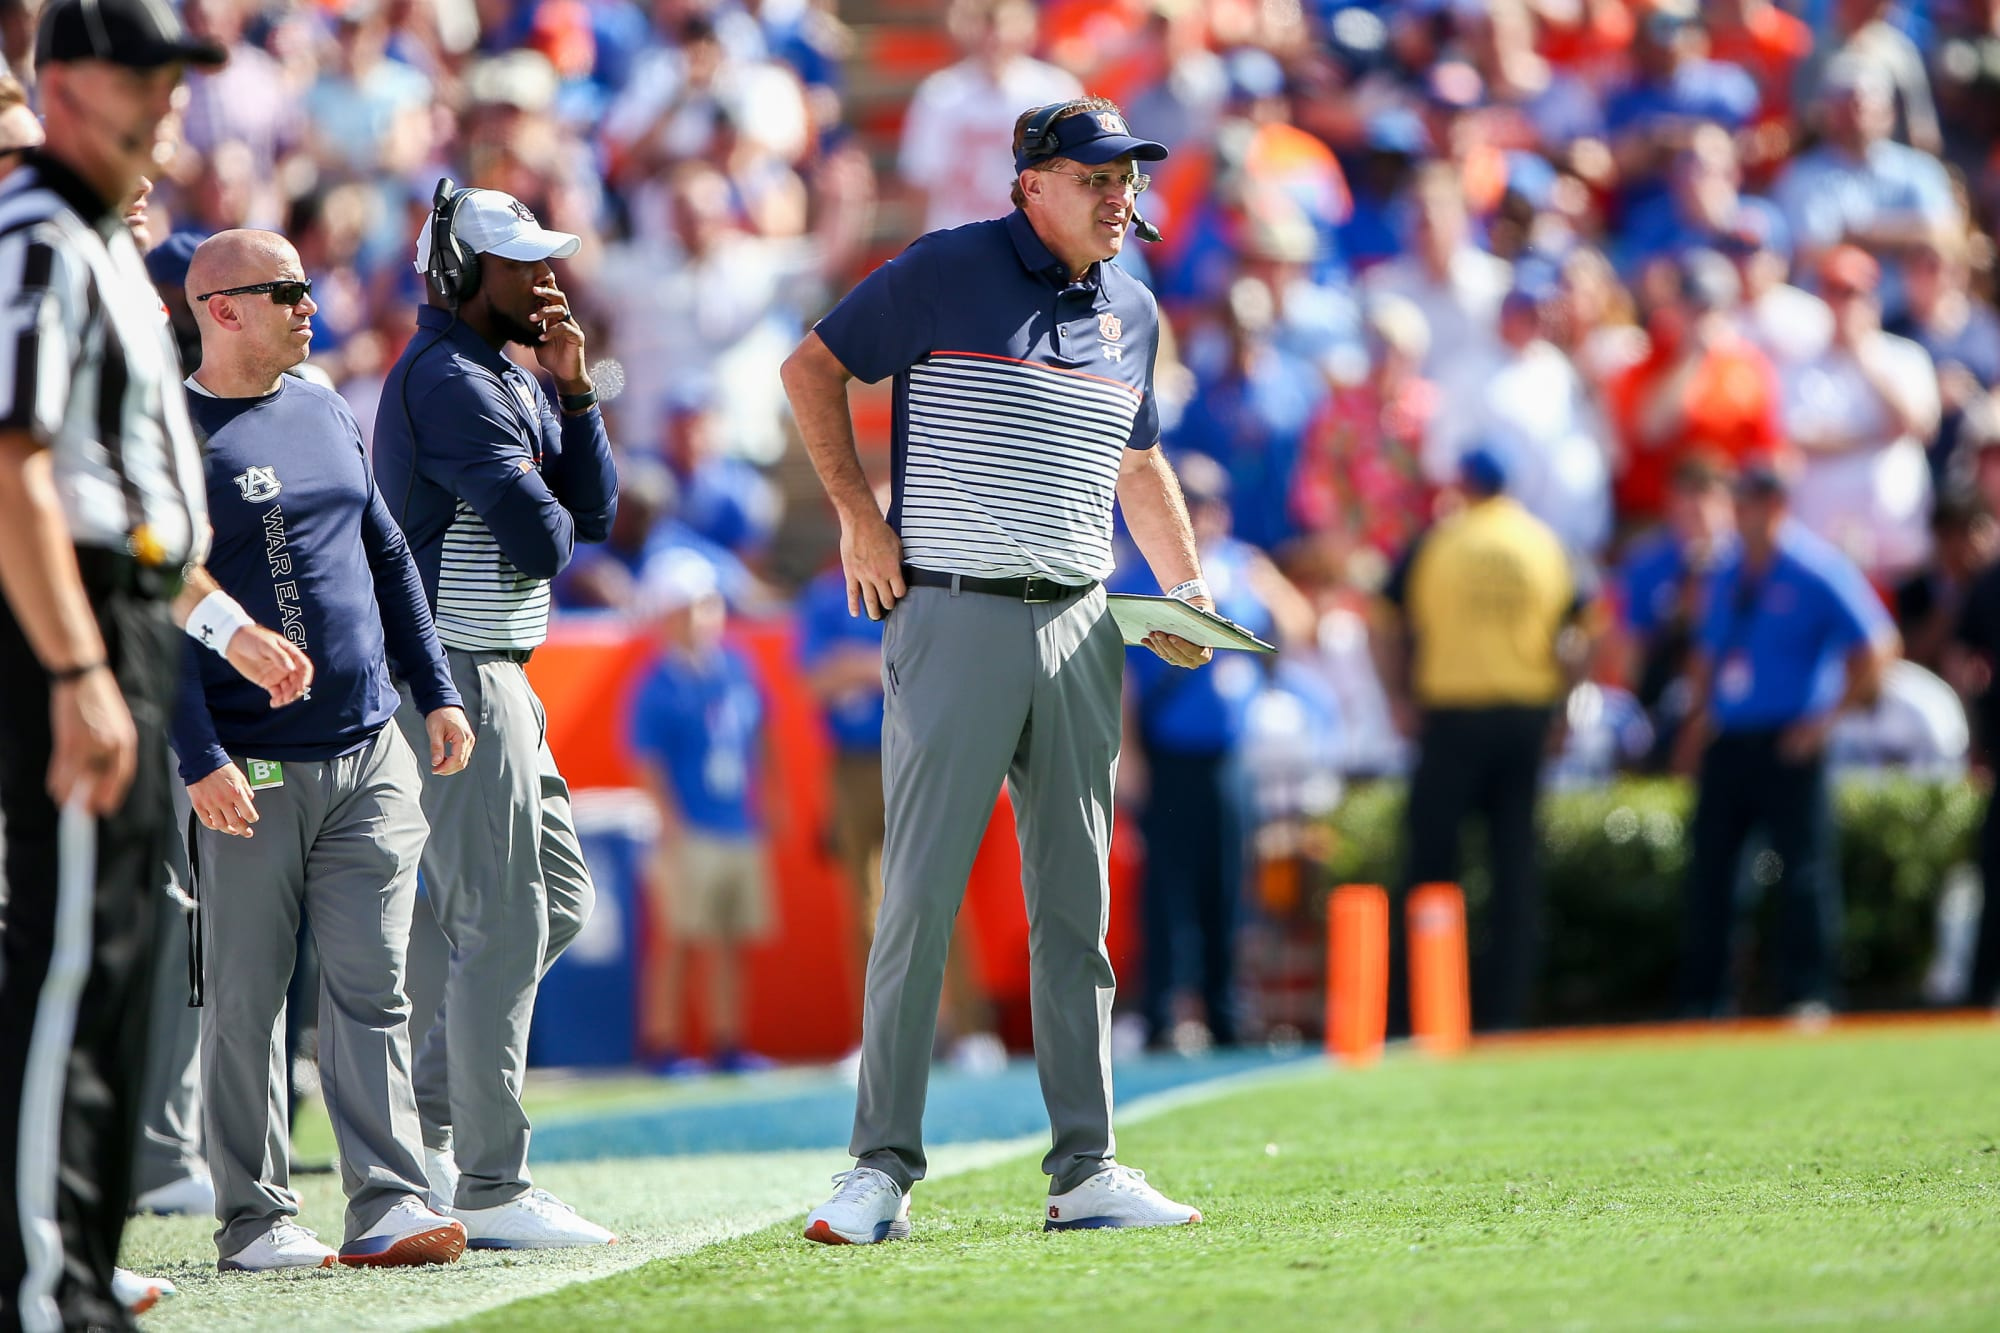 Auburn Football: 3 takeaways from season-opening ranked win over Kentucky